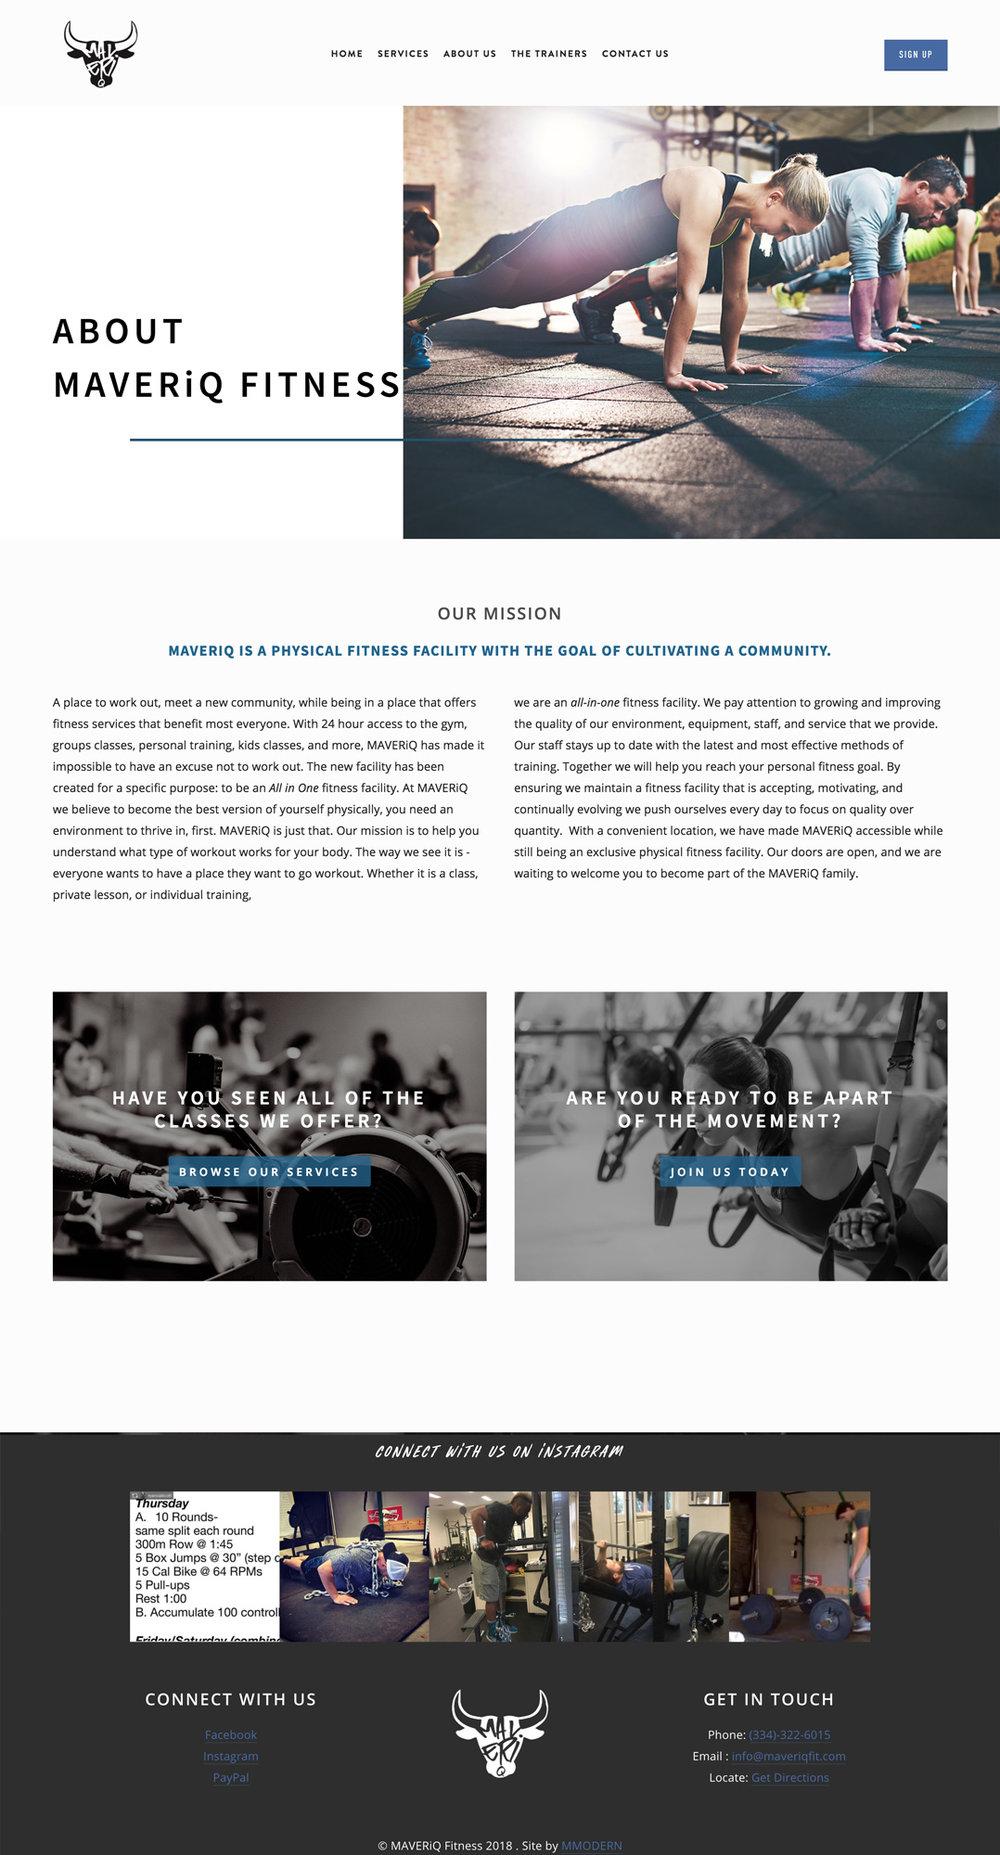 maveriq-page-2.jpg